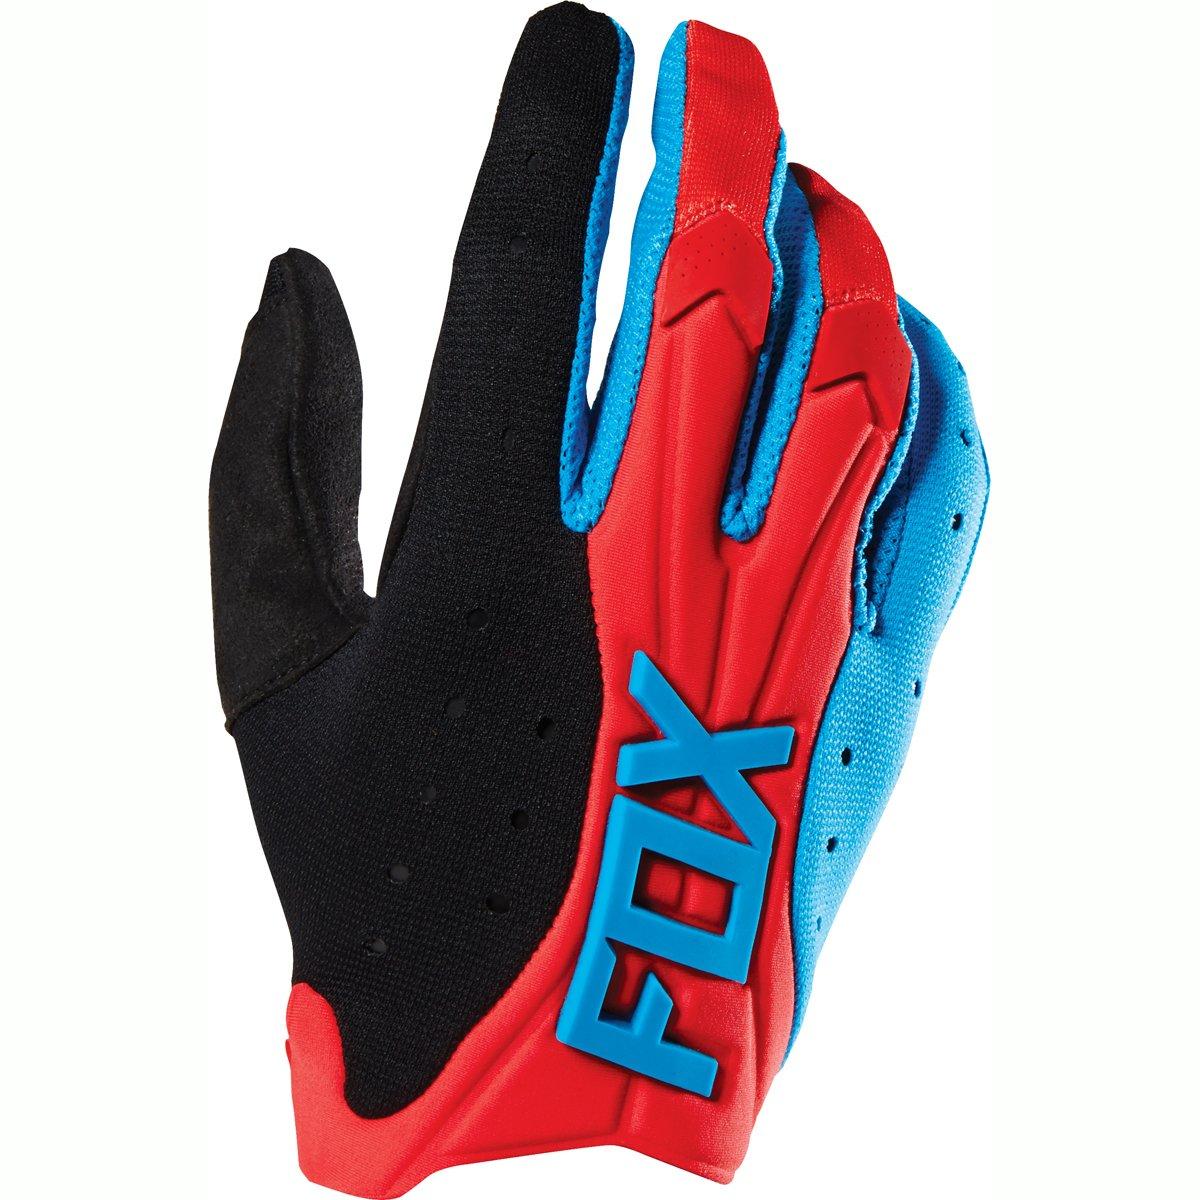 guante fox flexair azul/rojo talle xxl